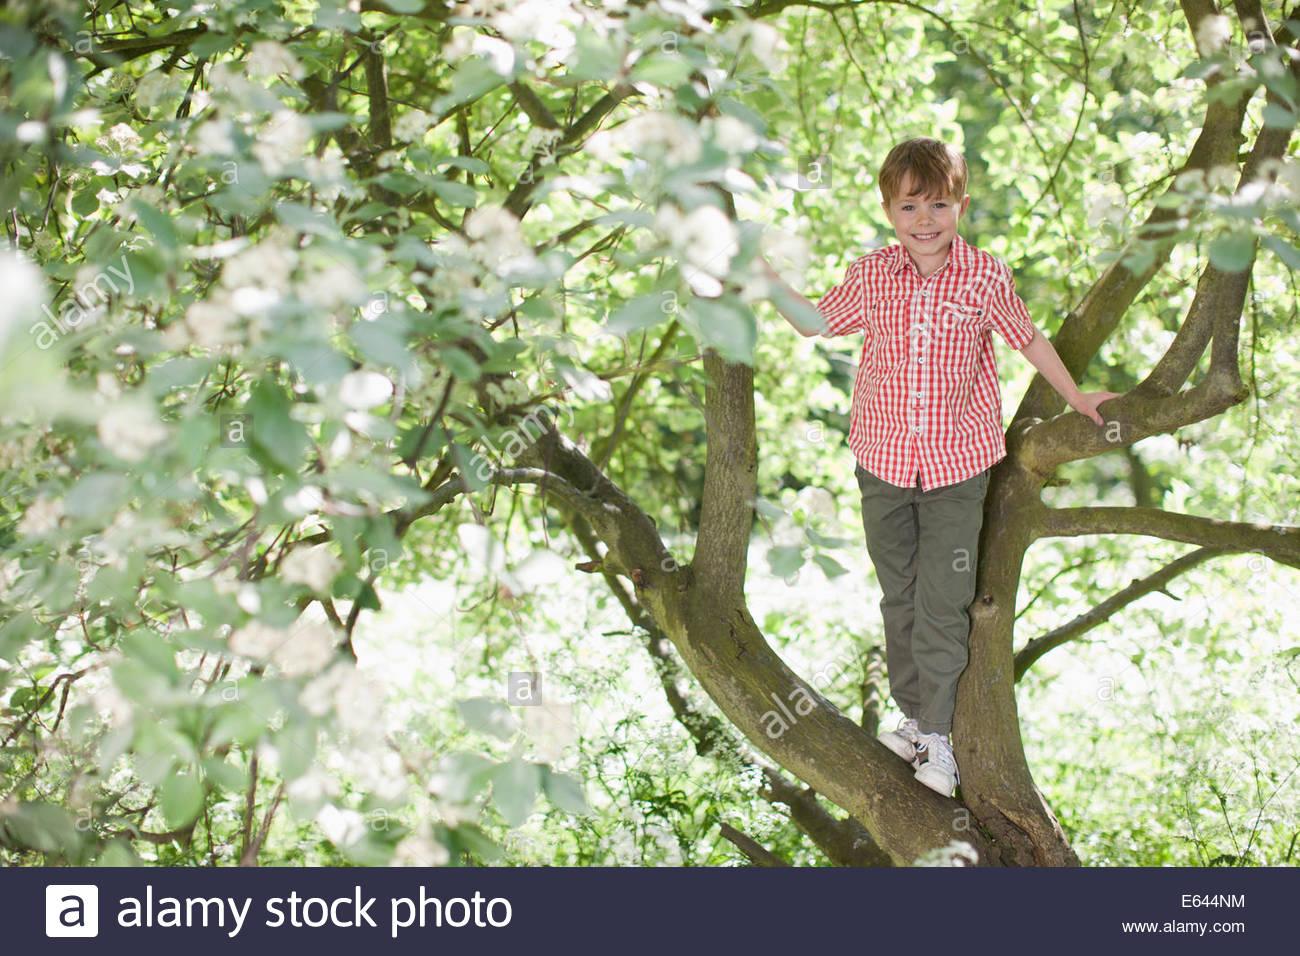 Boy climbing tree outdoors - Stock Image